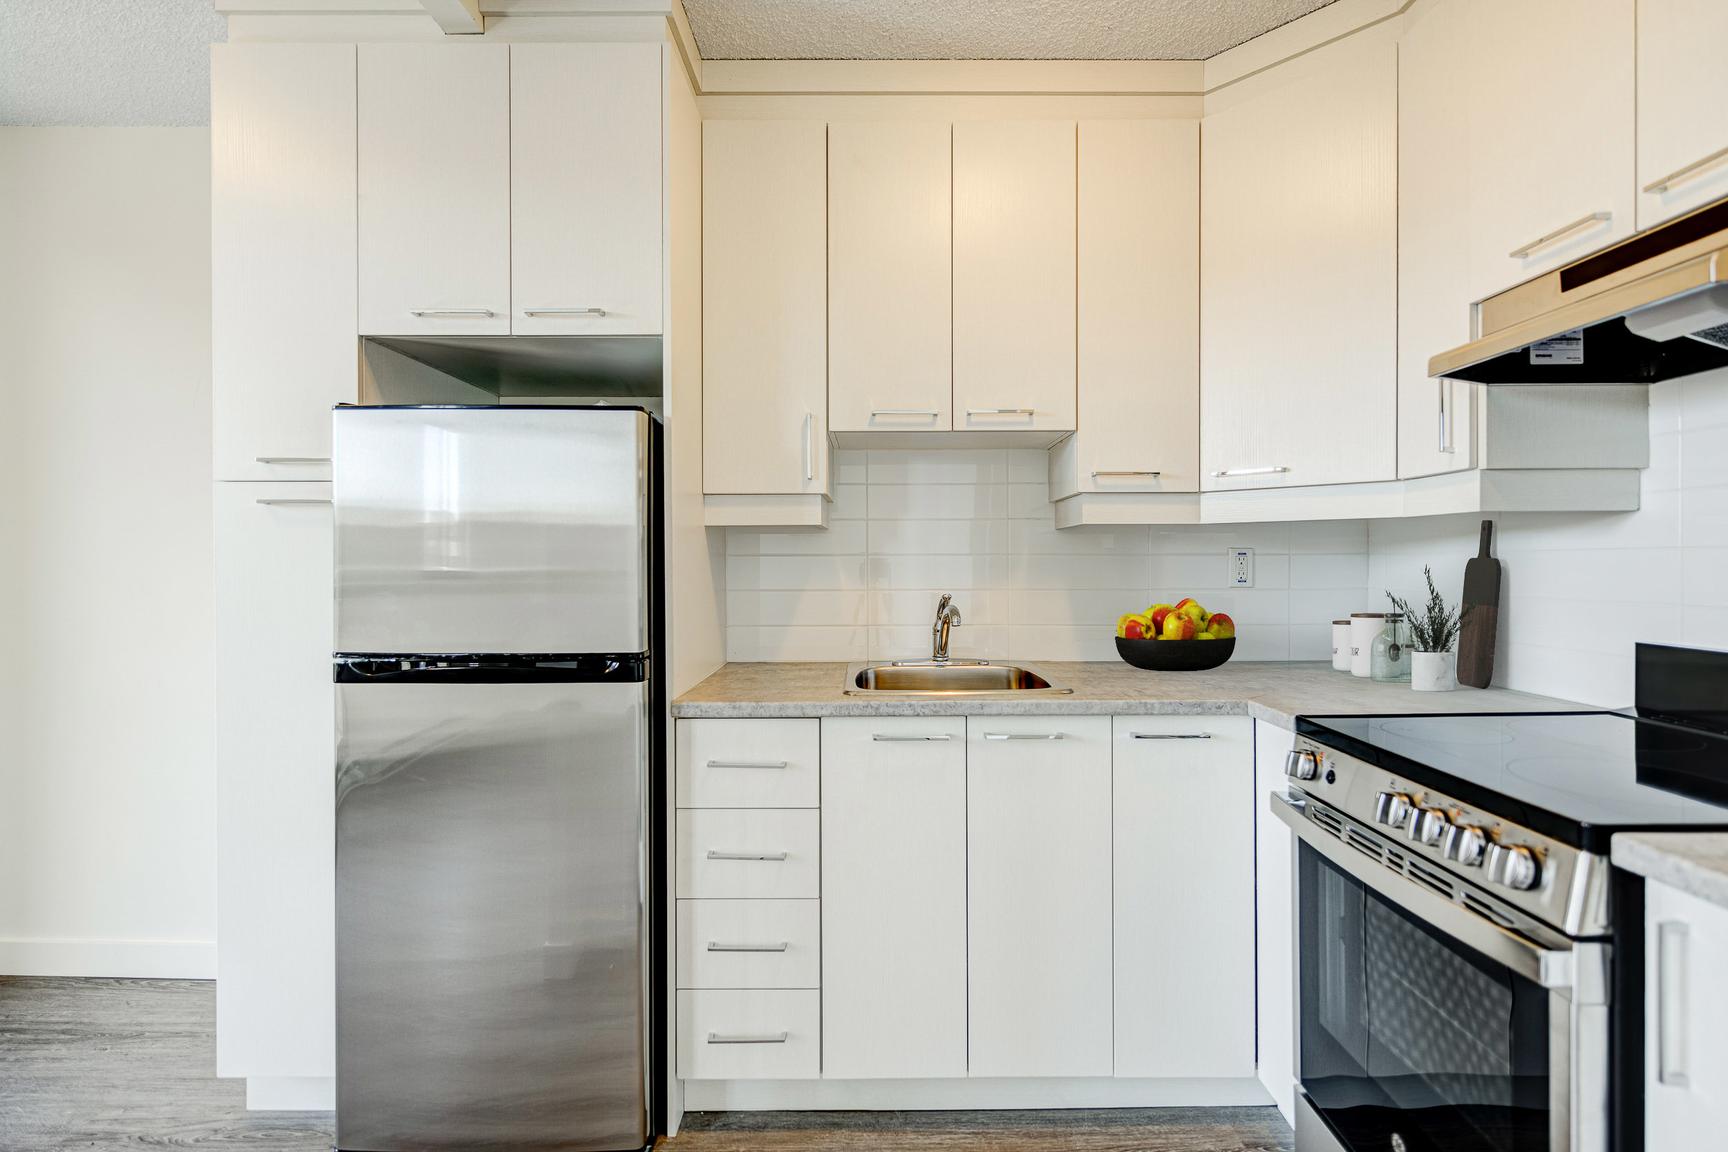 1 bedroom Apartments for rent in Laval at Le Quatre Cent - Photo 09 - RentQuebecApartments – L407184